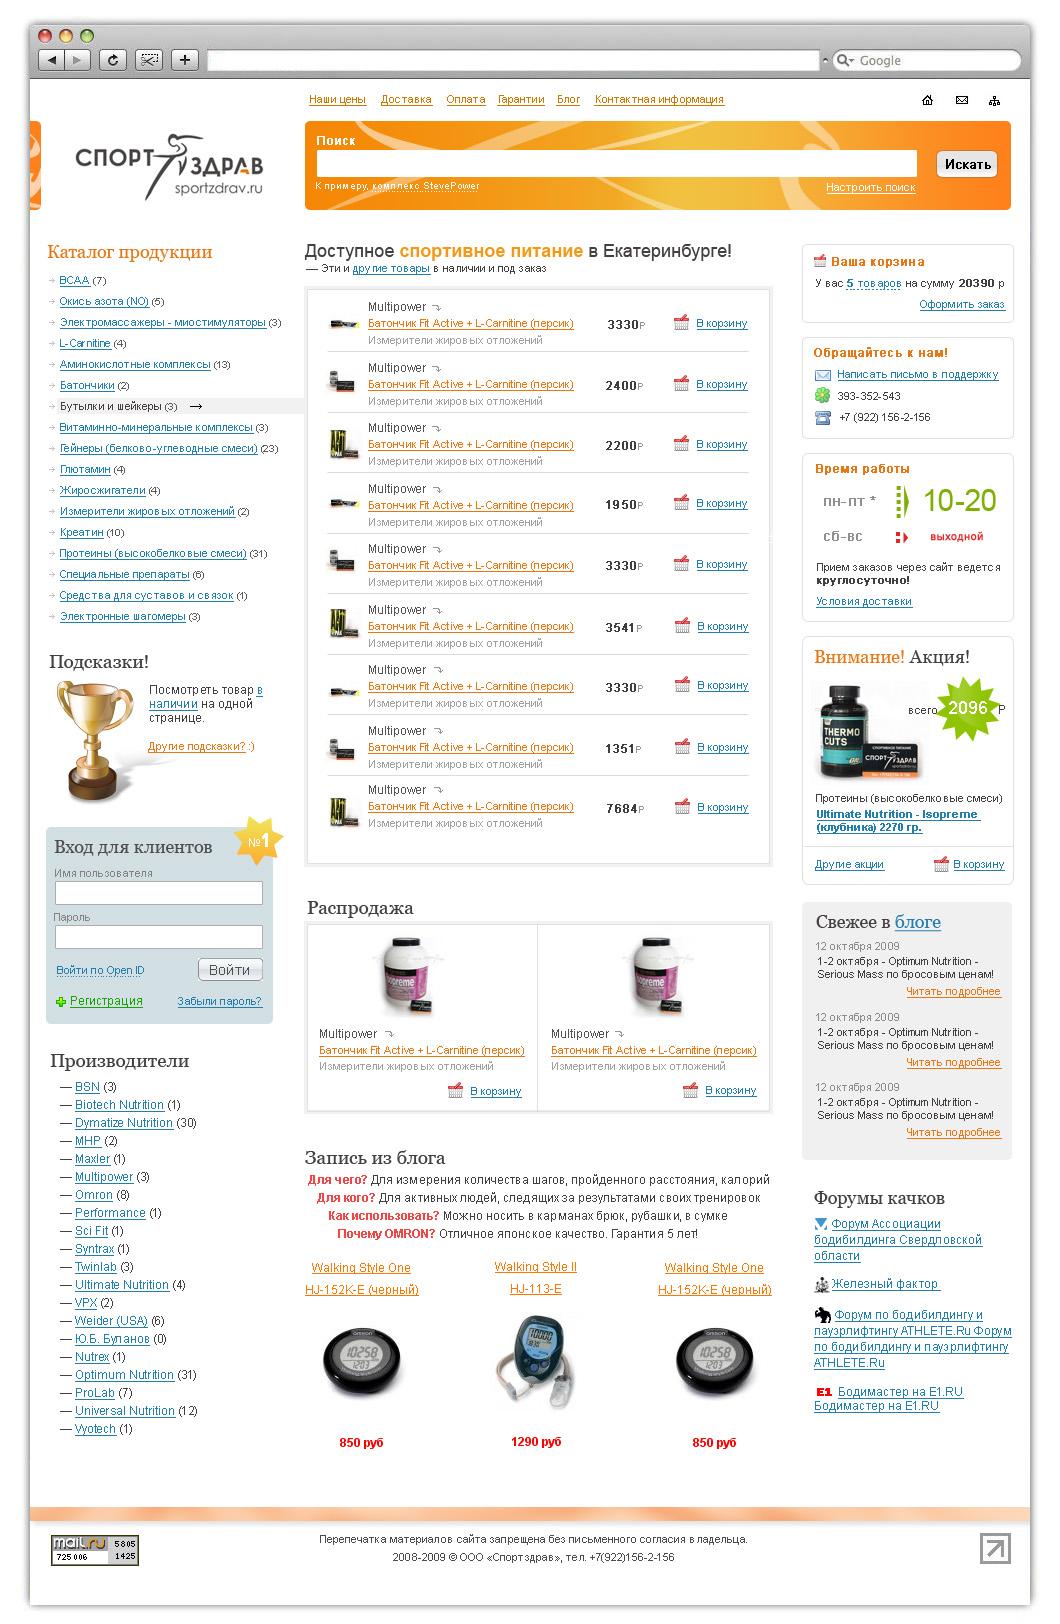 СпортЗдрав - интернет-магазин